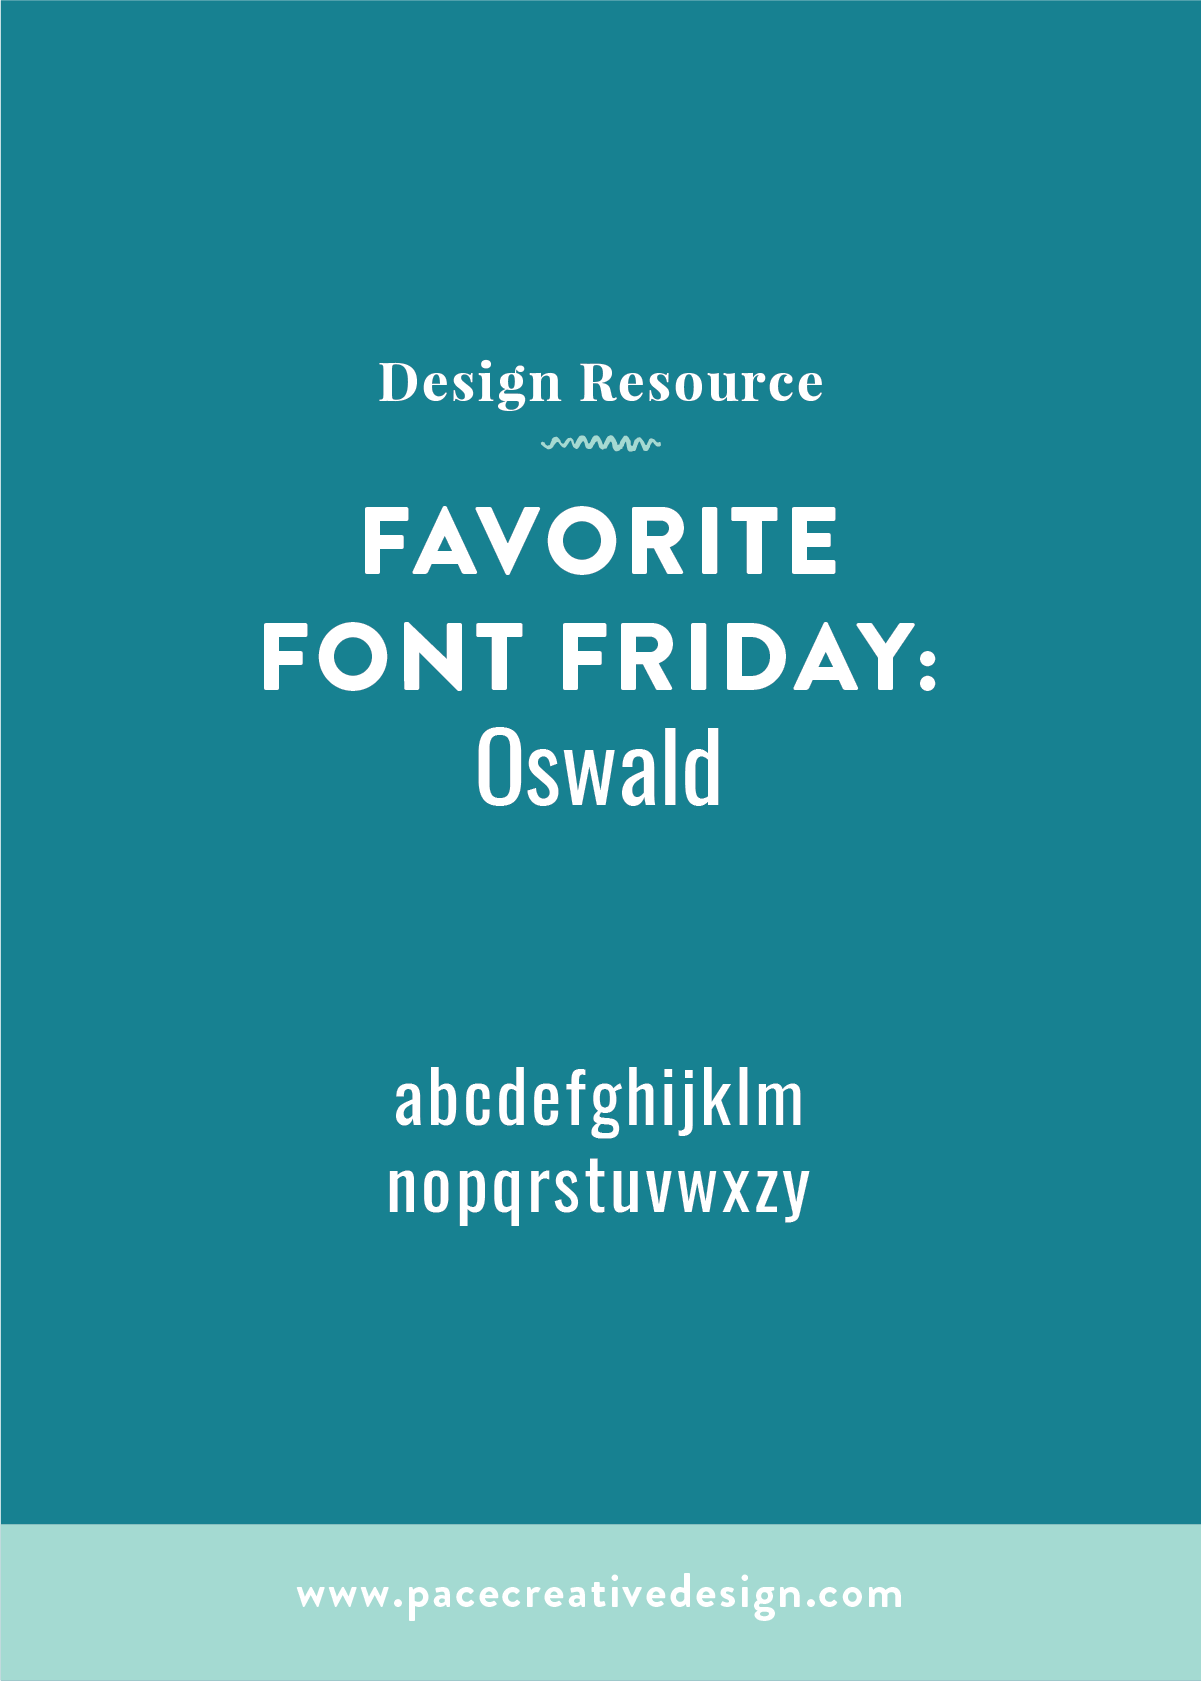 Favorite Font Friday No. 1 – Oswald | Pace Creative Design Studio